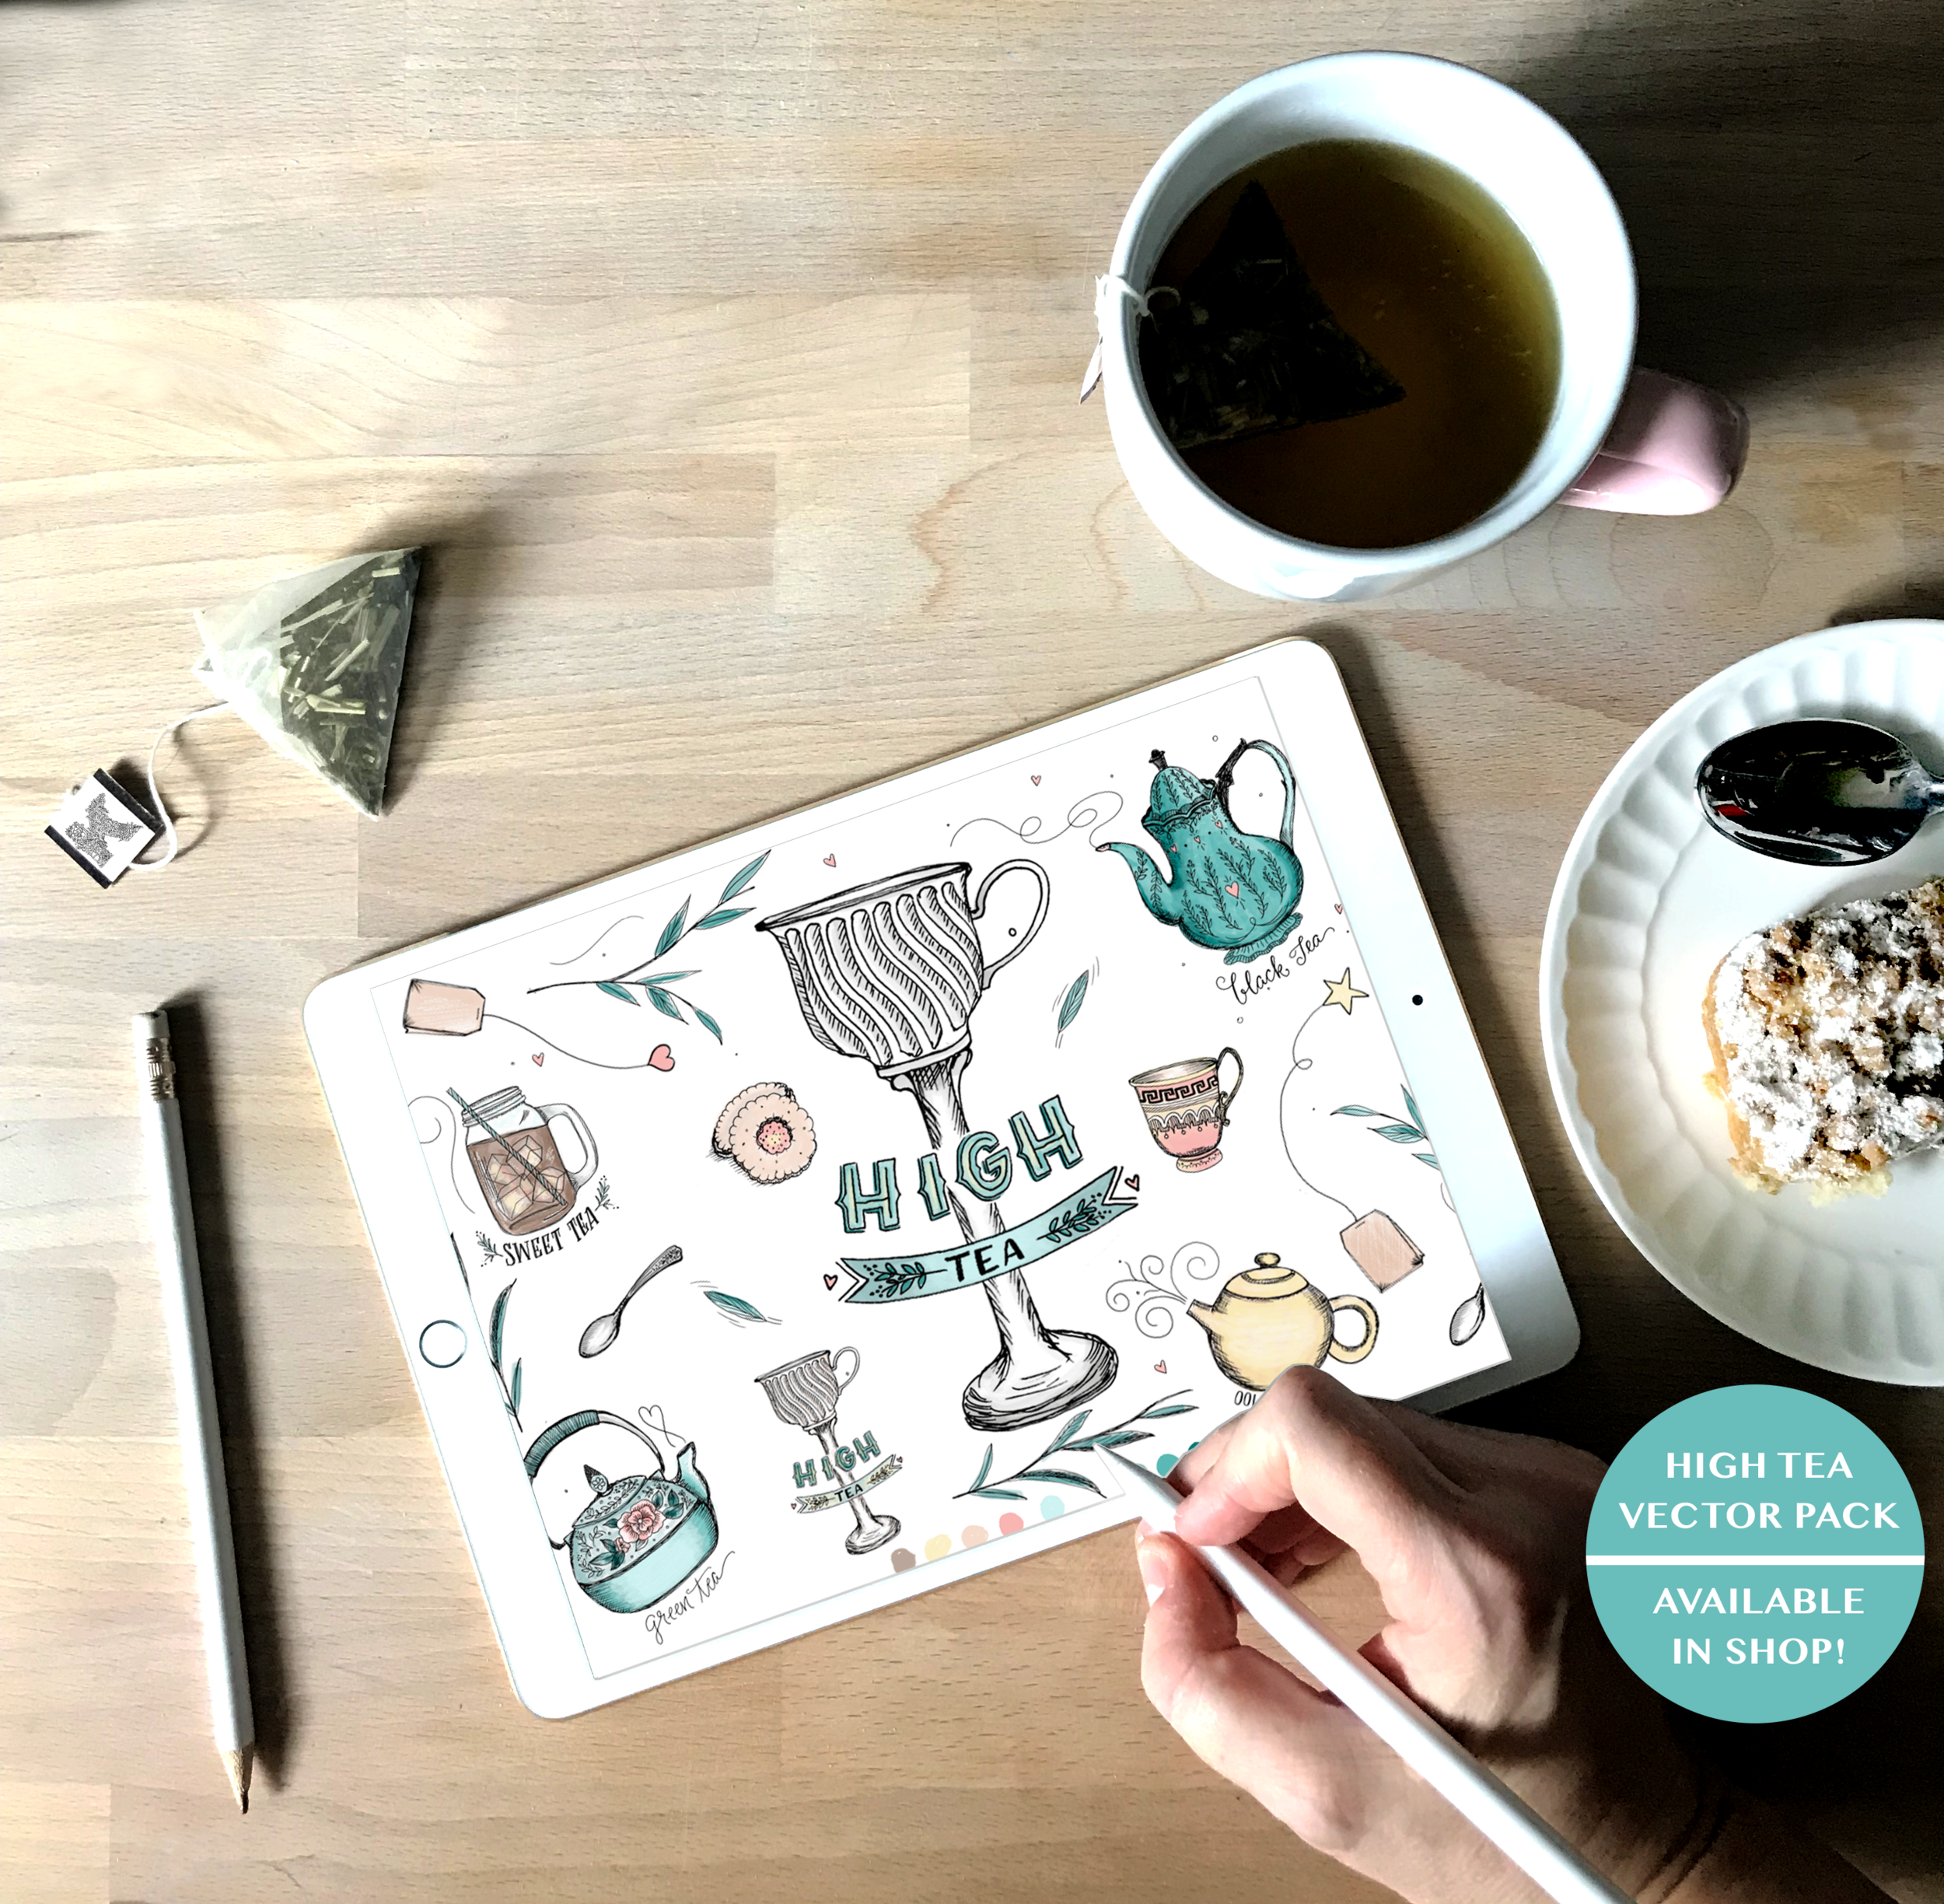 Copy of High Tea Illustration Vector Pack Teapot Illustrations